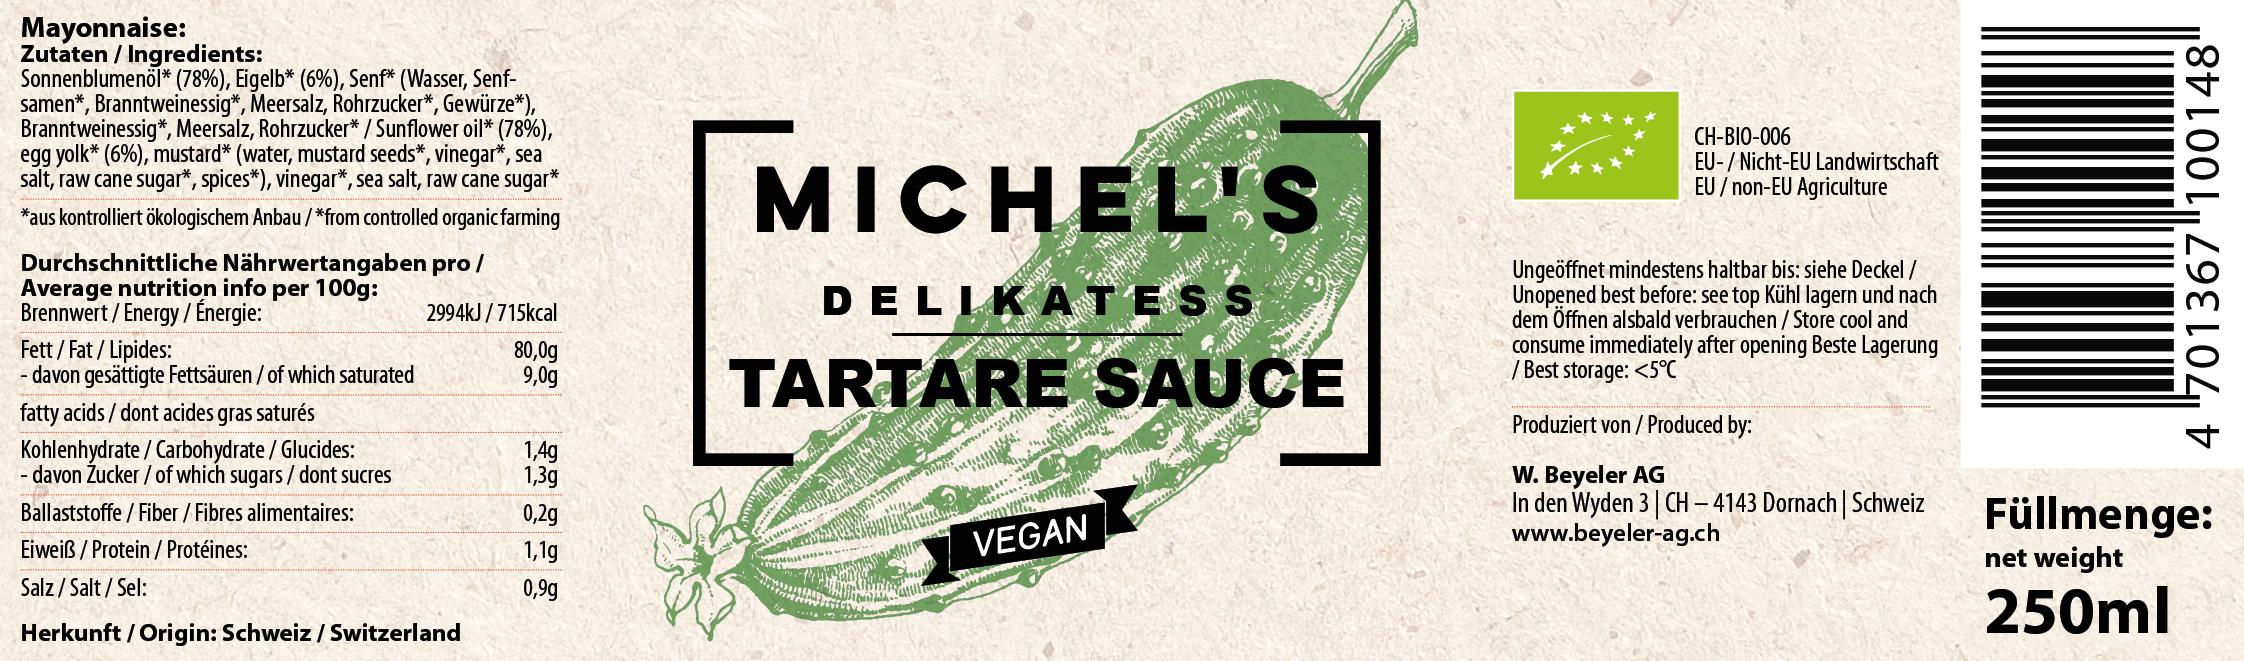 02900218_Michels_Logo_Design_Packaging_Mayonnaise19.jpg